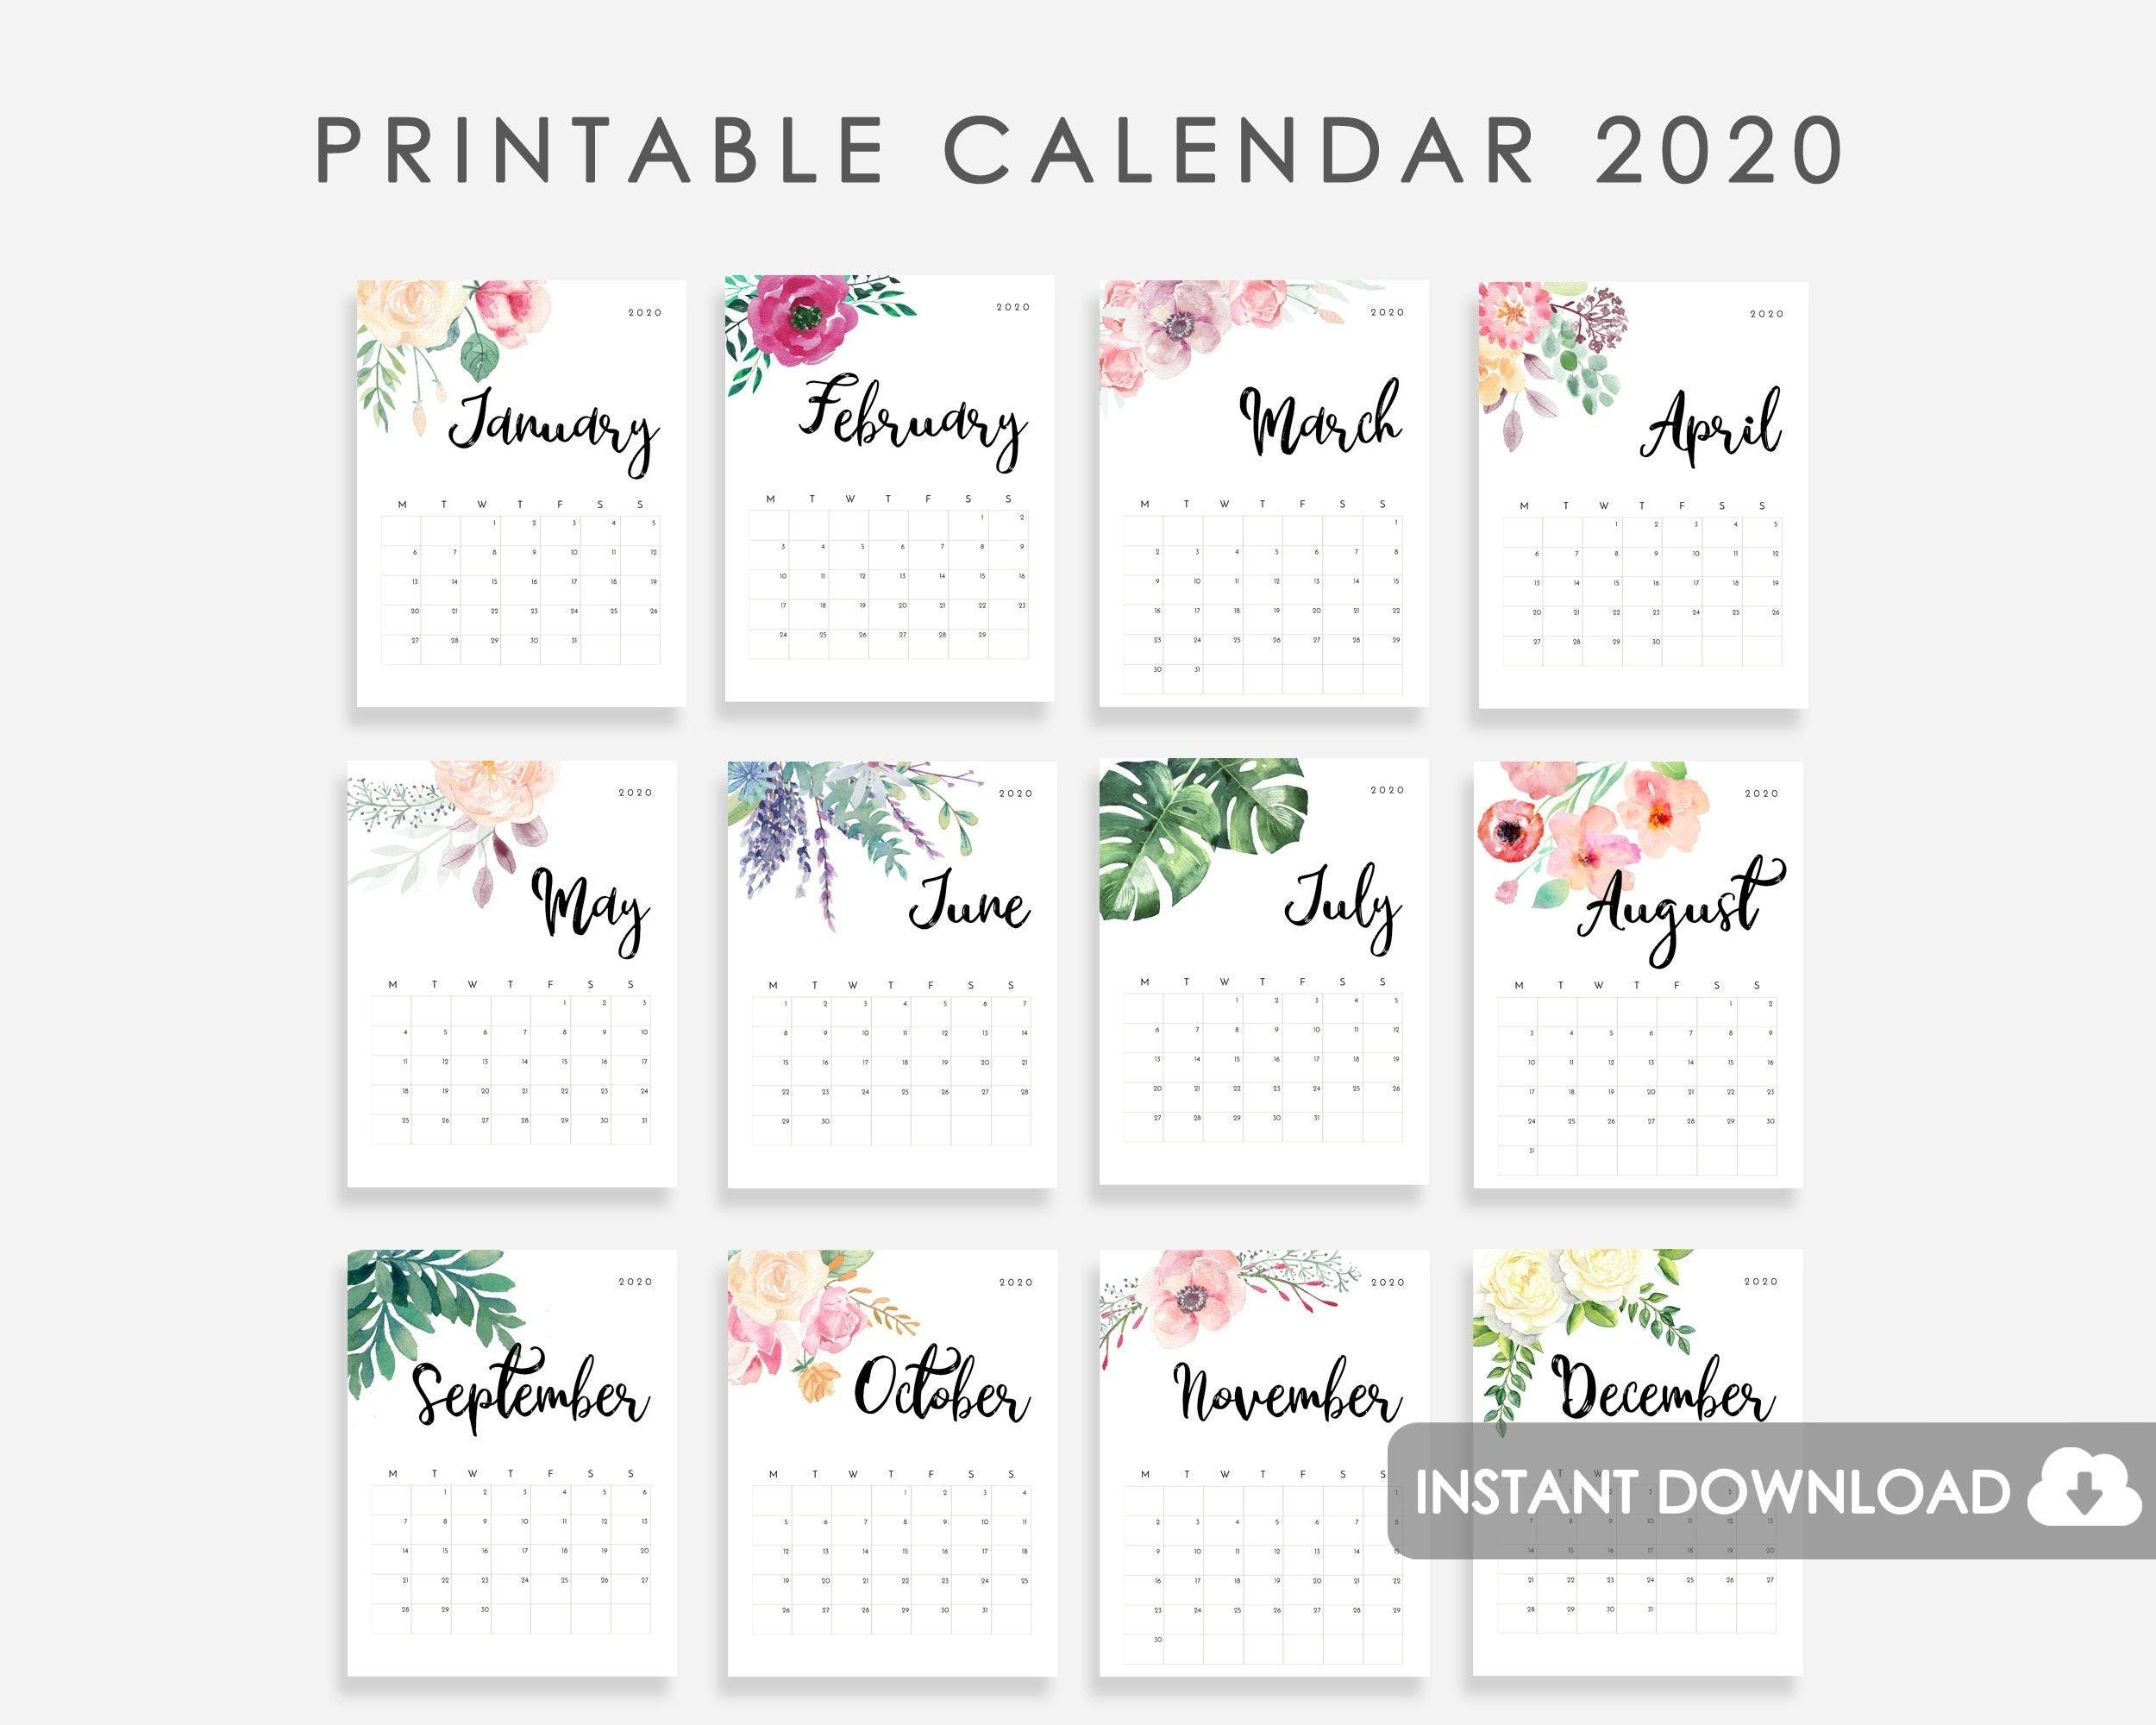 Collect Rut Prediction 2020 Illinois   Calendar Printables Free Blank-2021 Deer Rut Calendar In Kentucky